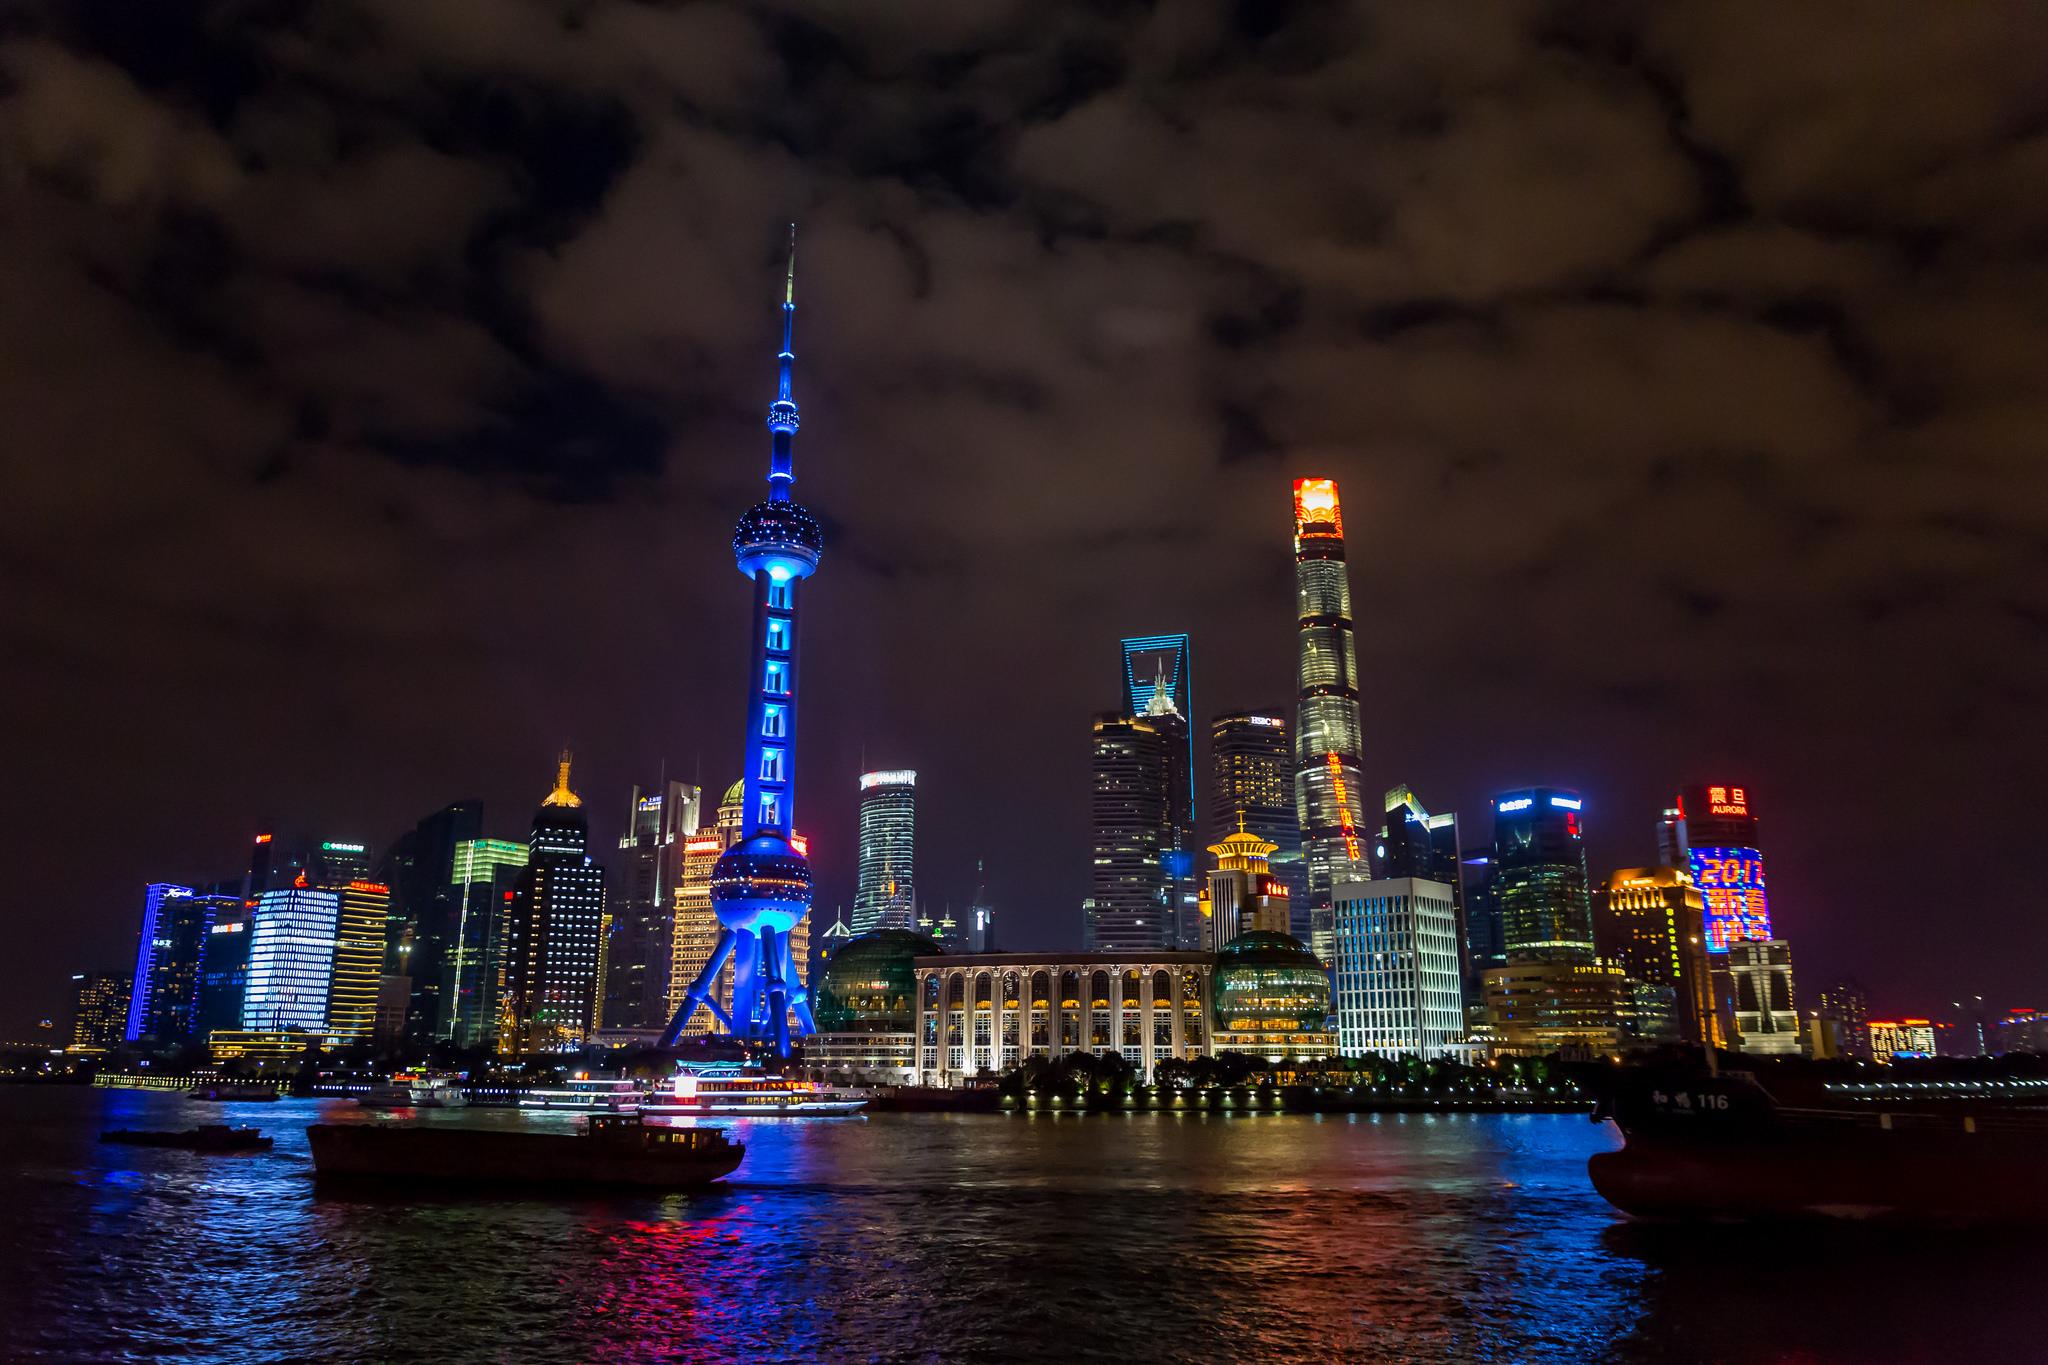 Shanghai's Pudong Skyline from Huangpu River, China